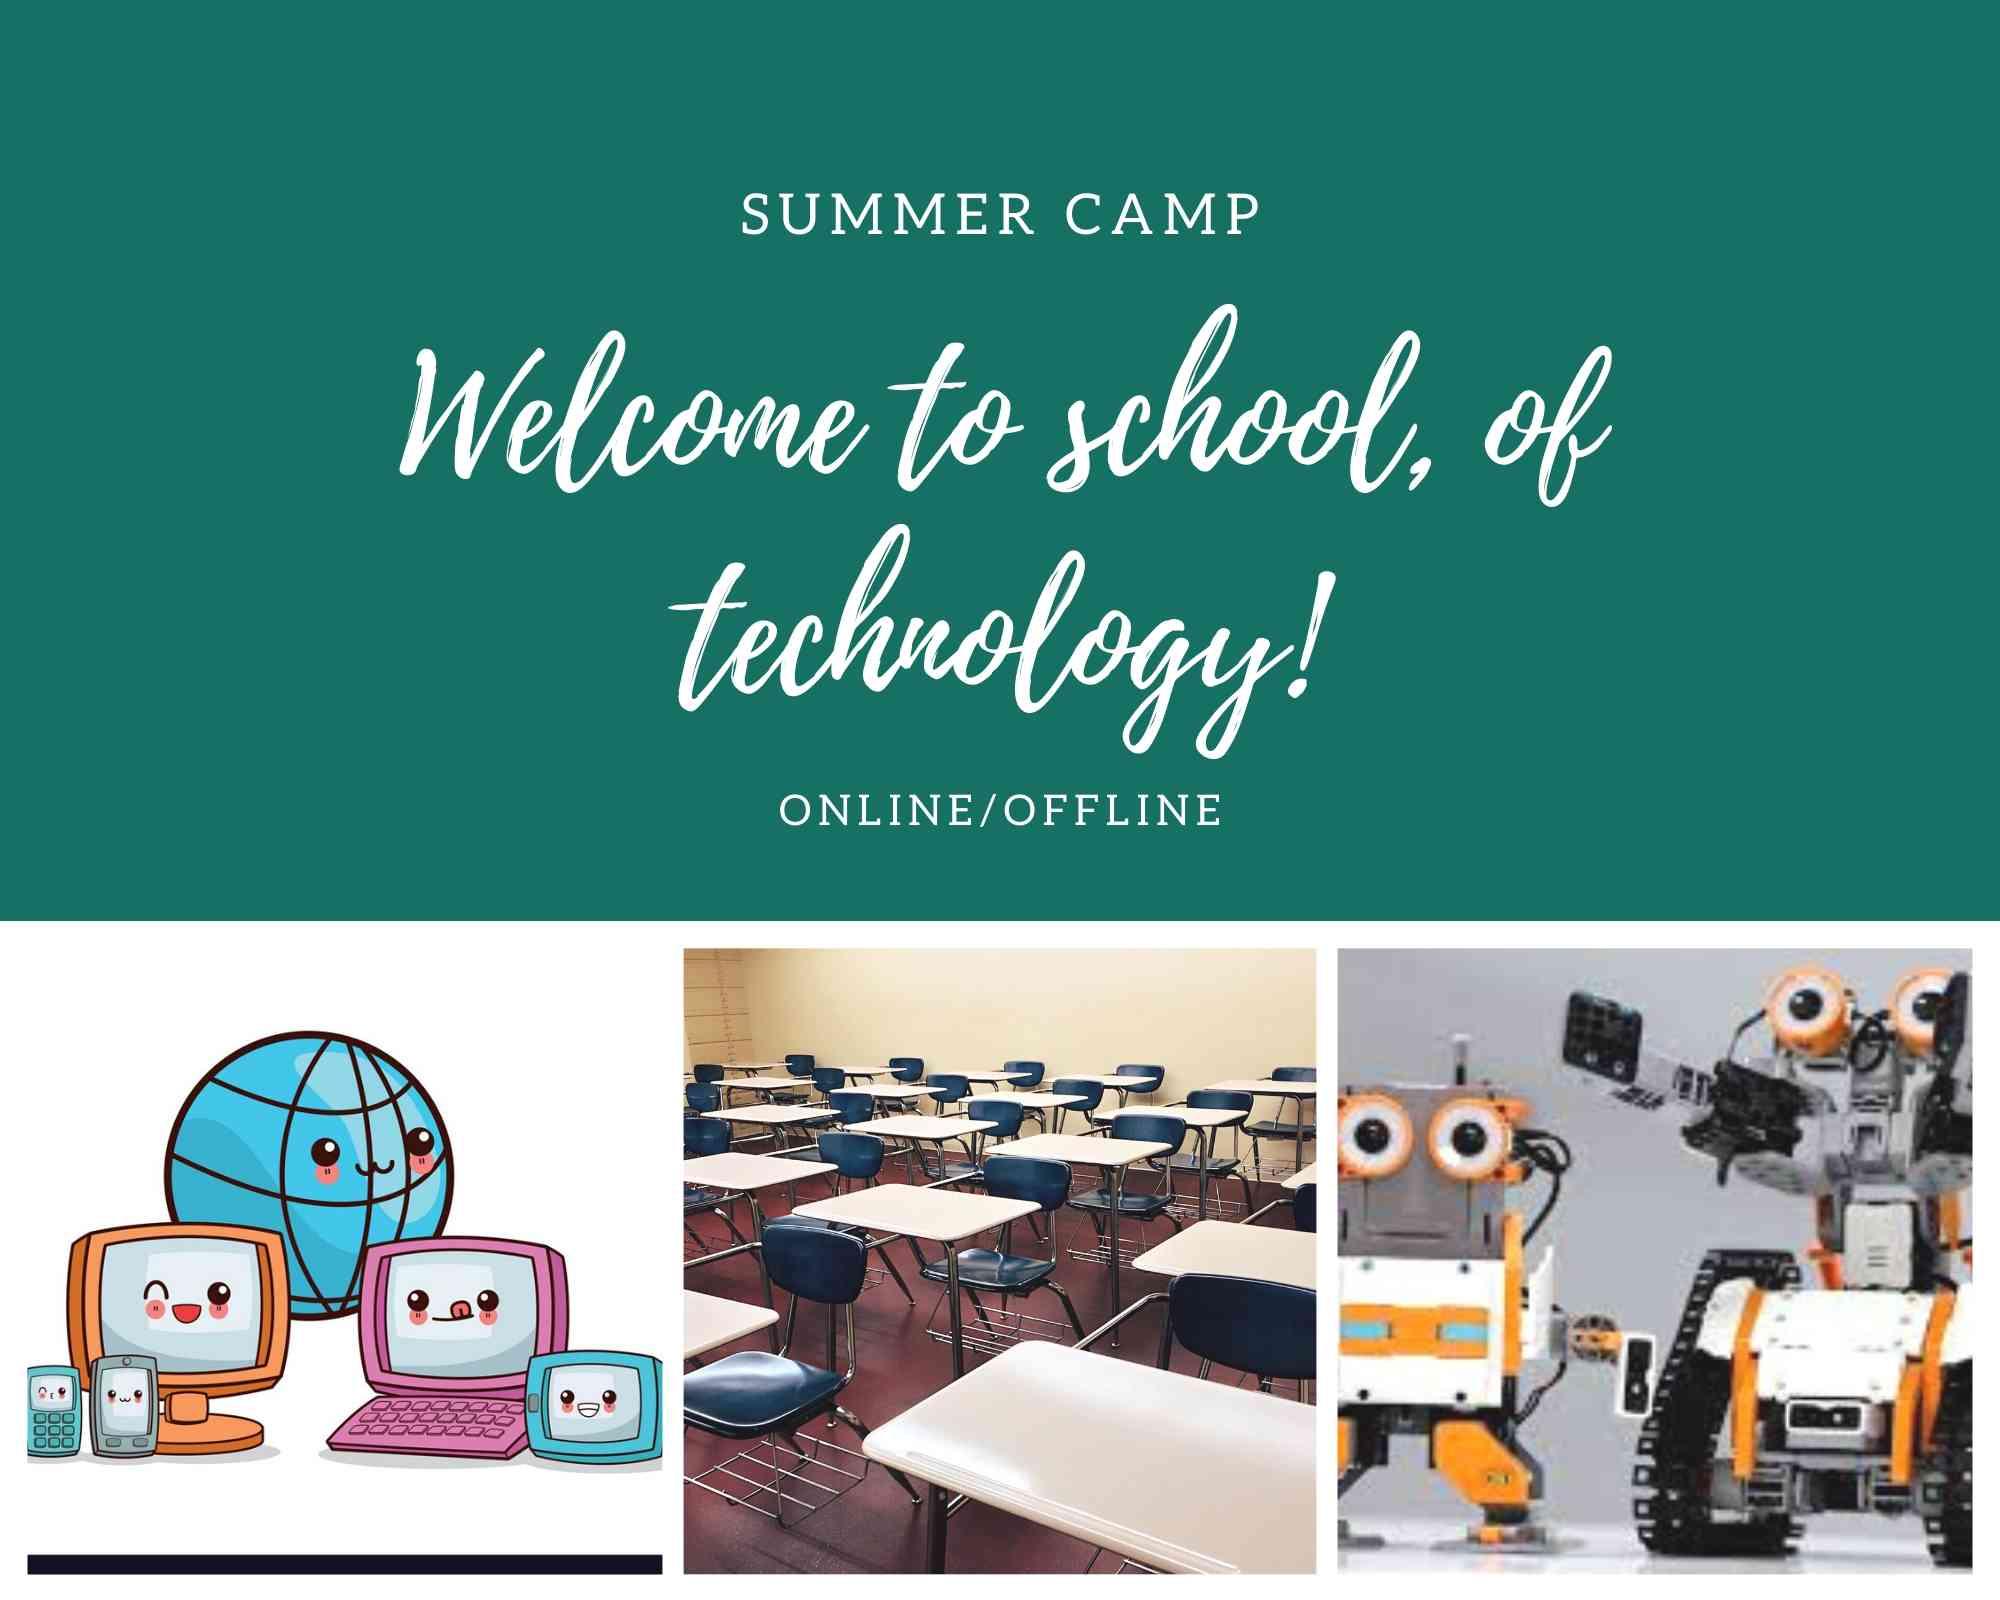 School summer camp